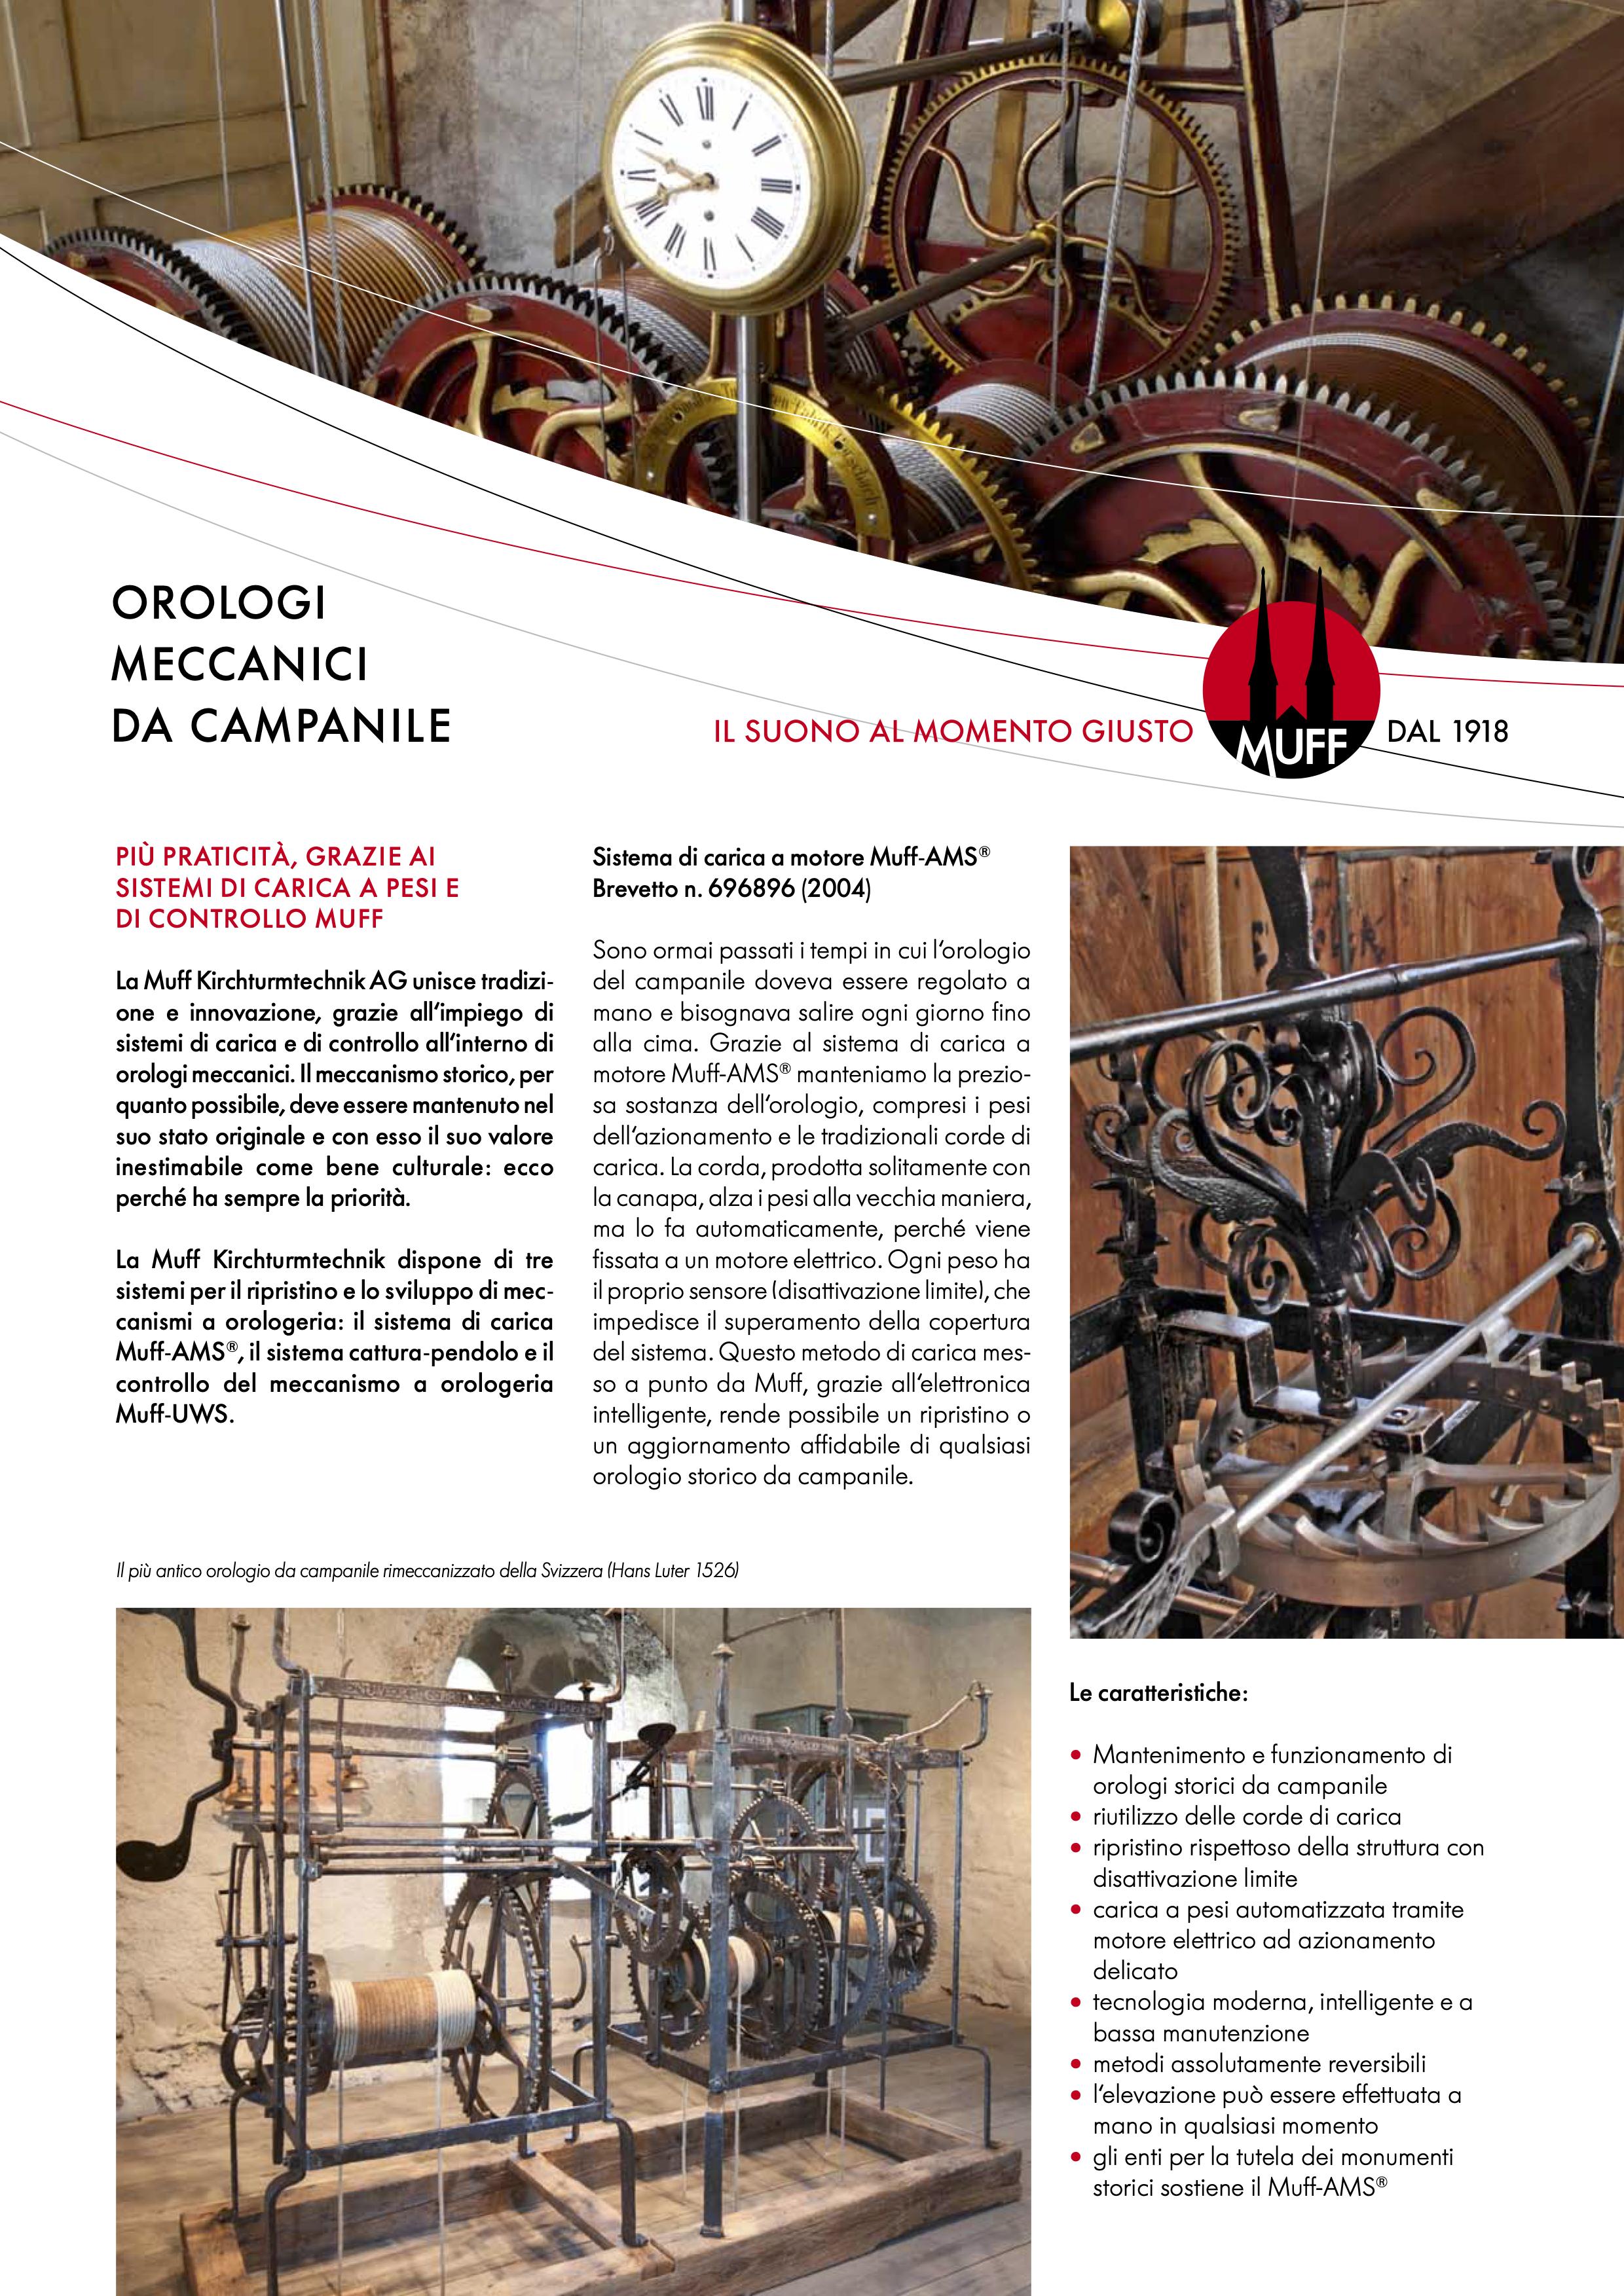 Orologi meccanici da campanile